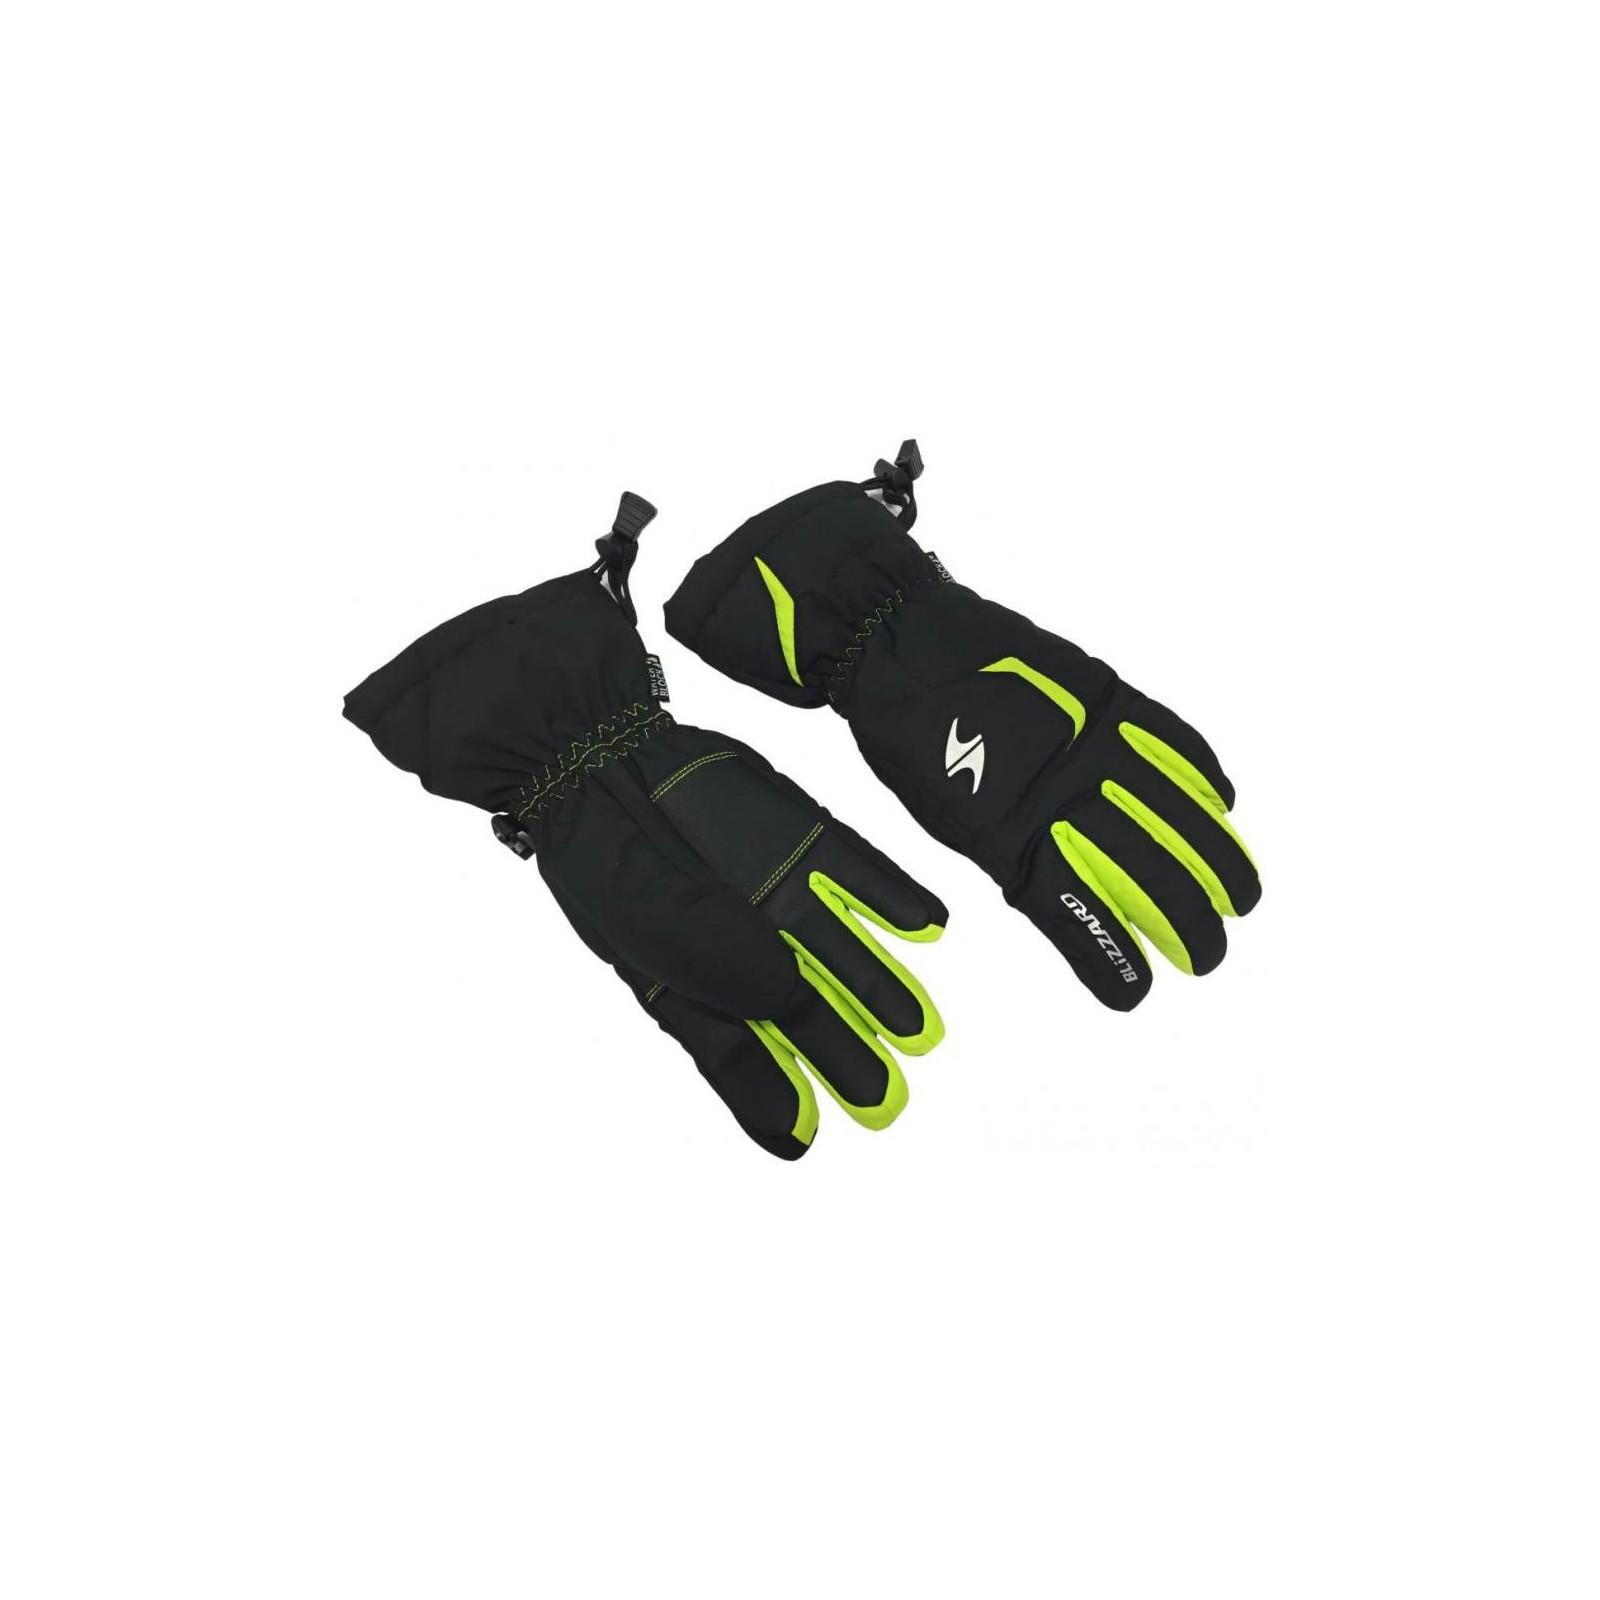 Blizzard rider junior ski gloves black green - juniorske-lyziarske-rukavice- blizzard a2e410791a8